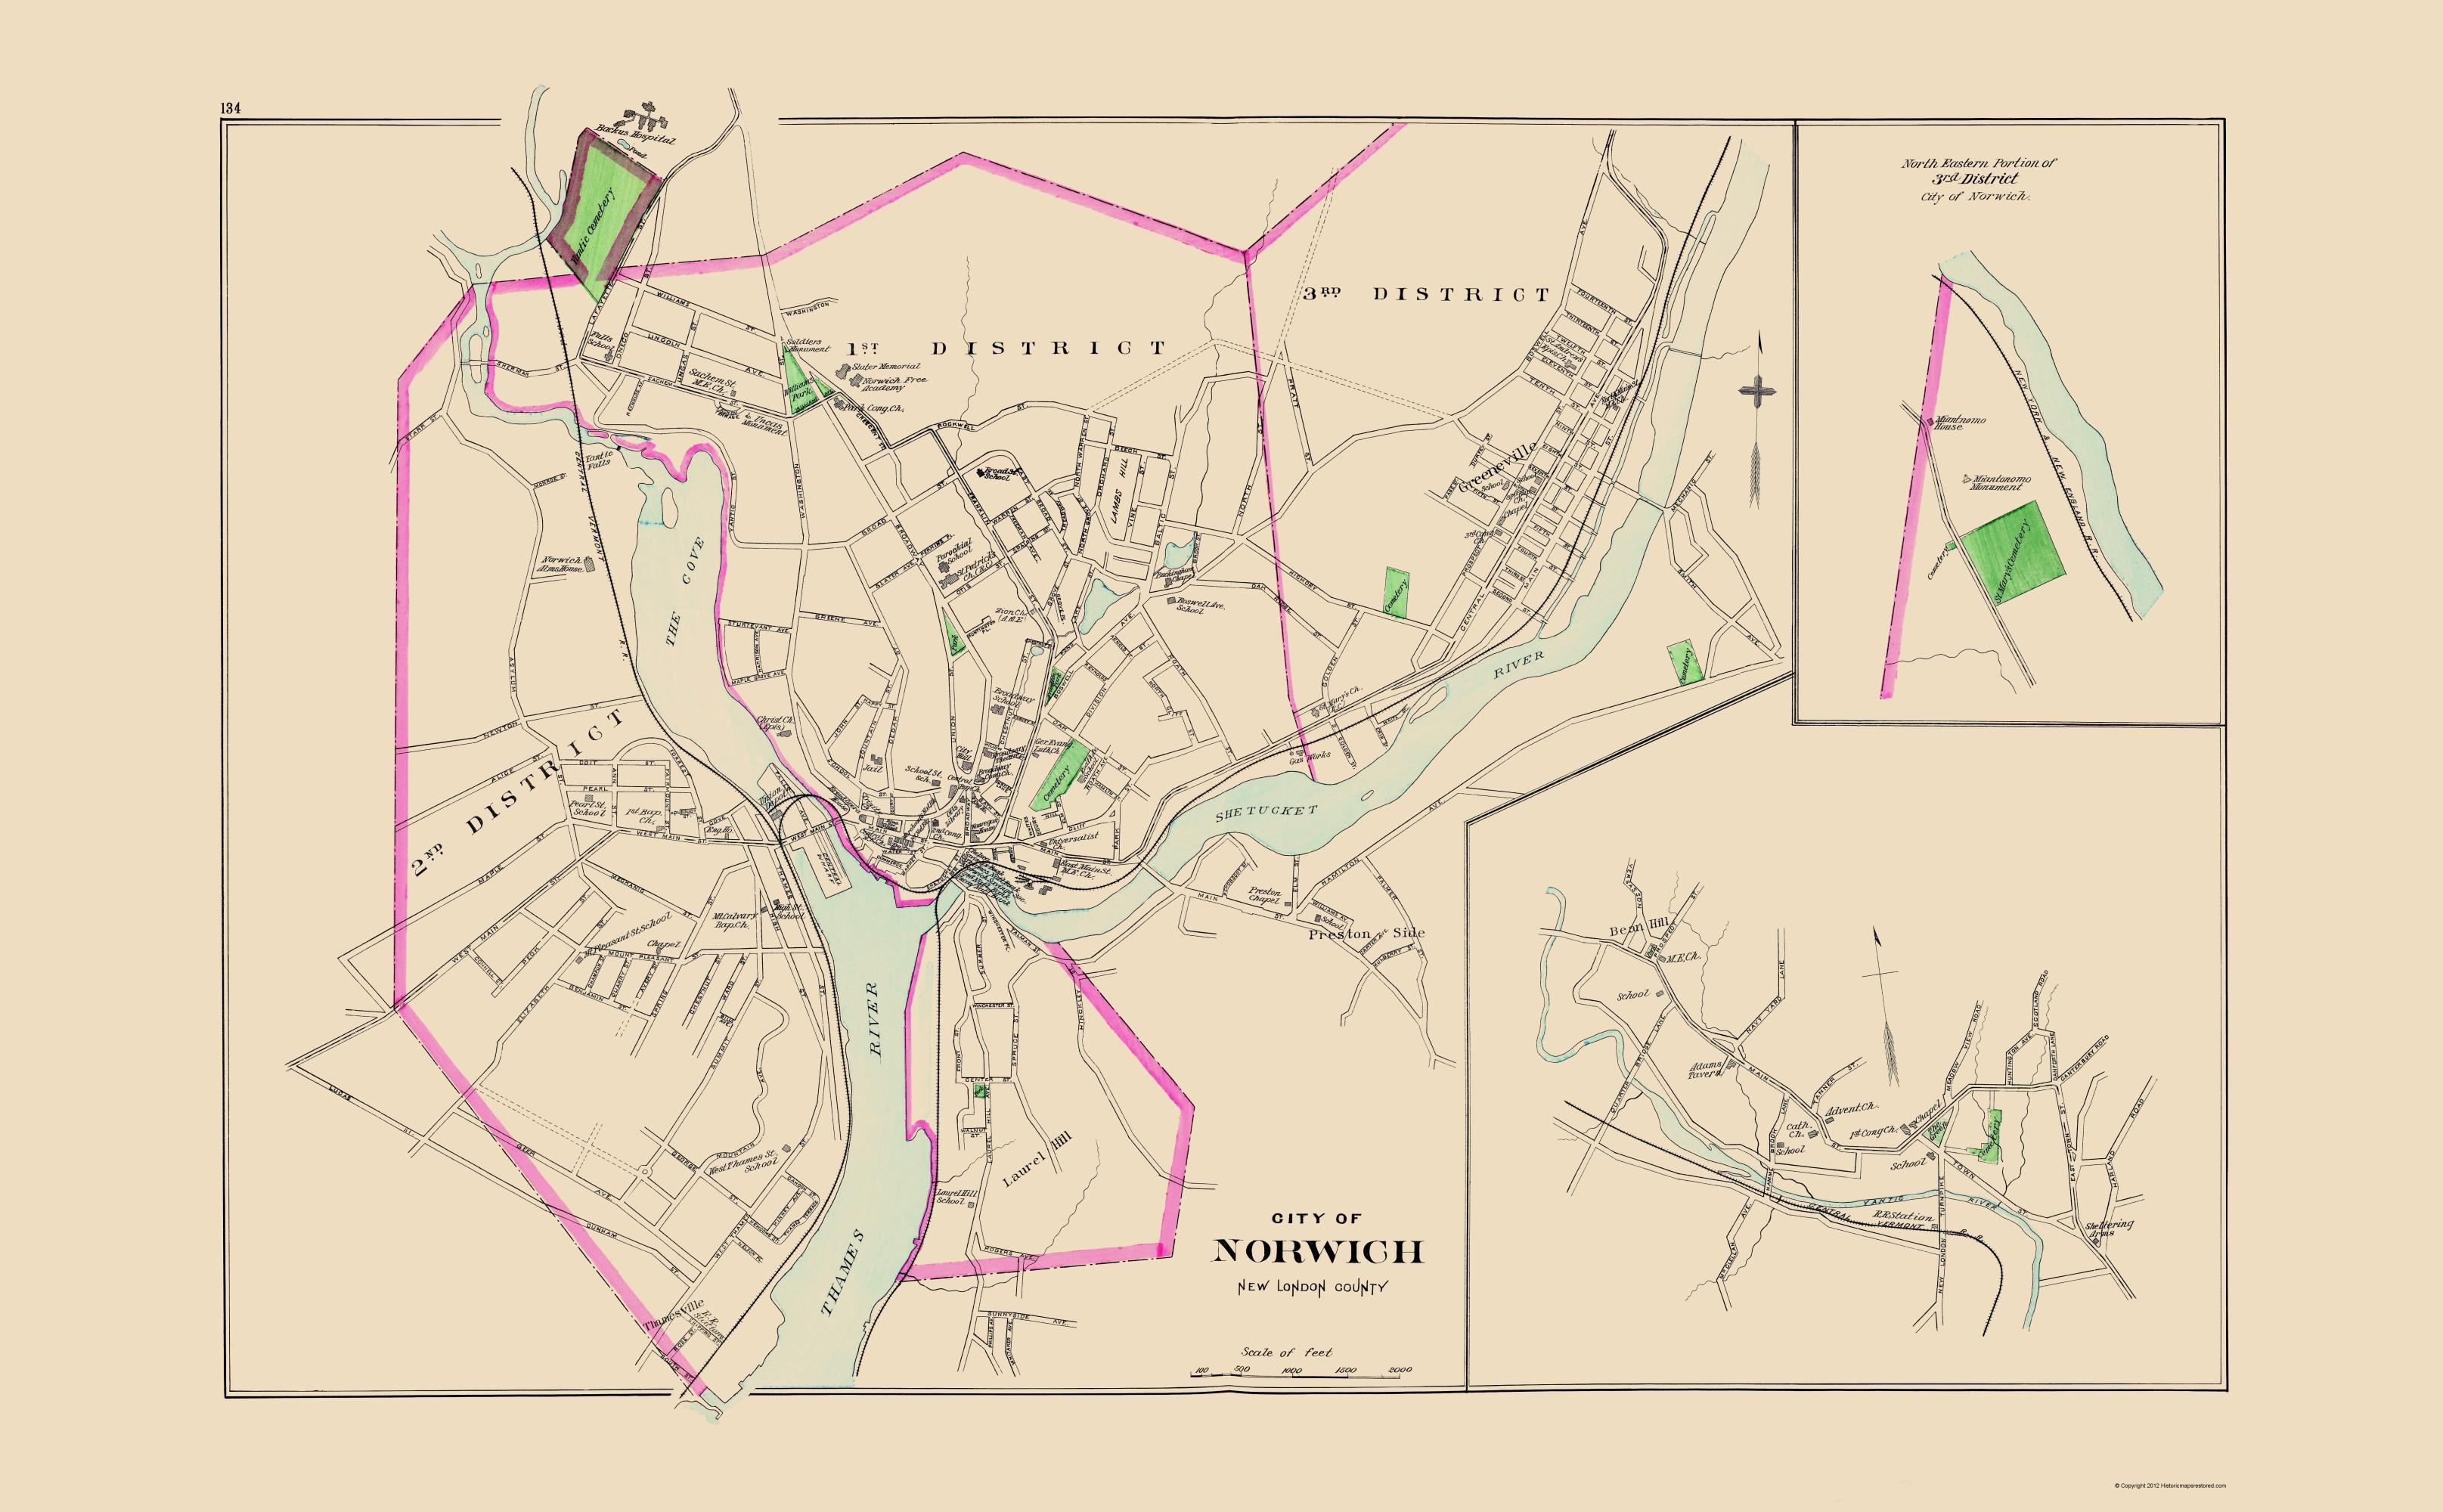 Old City Map - Norwich Connecticut - Hurd 1893